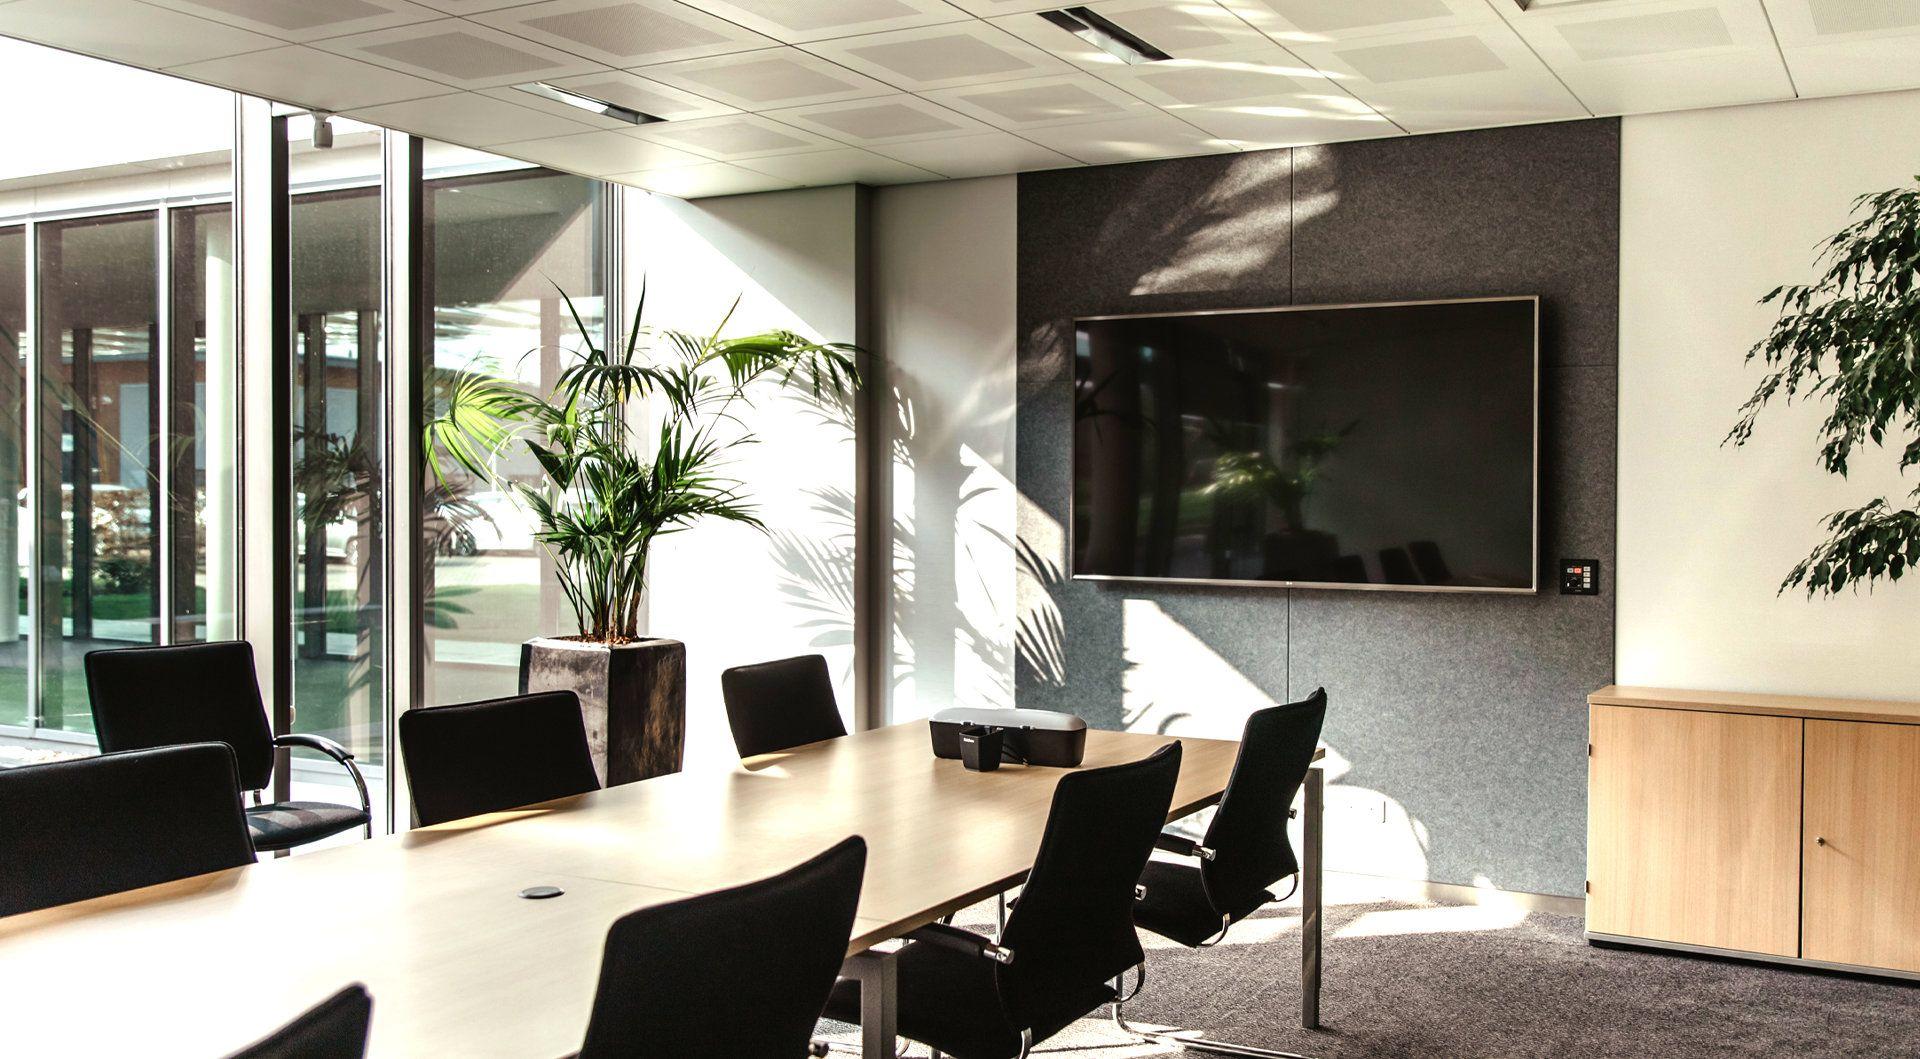 "LG 65UH7F beeldkrant 165,1 cm (65"") IPS 4K Ultra HD Digitale signage flatscreen Zwart Web OS - Case studie de vries"